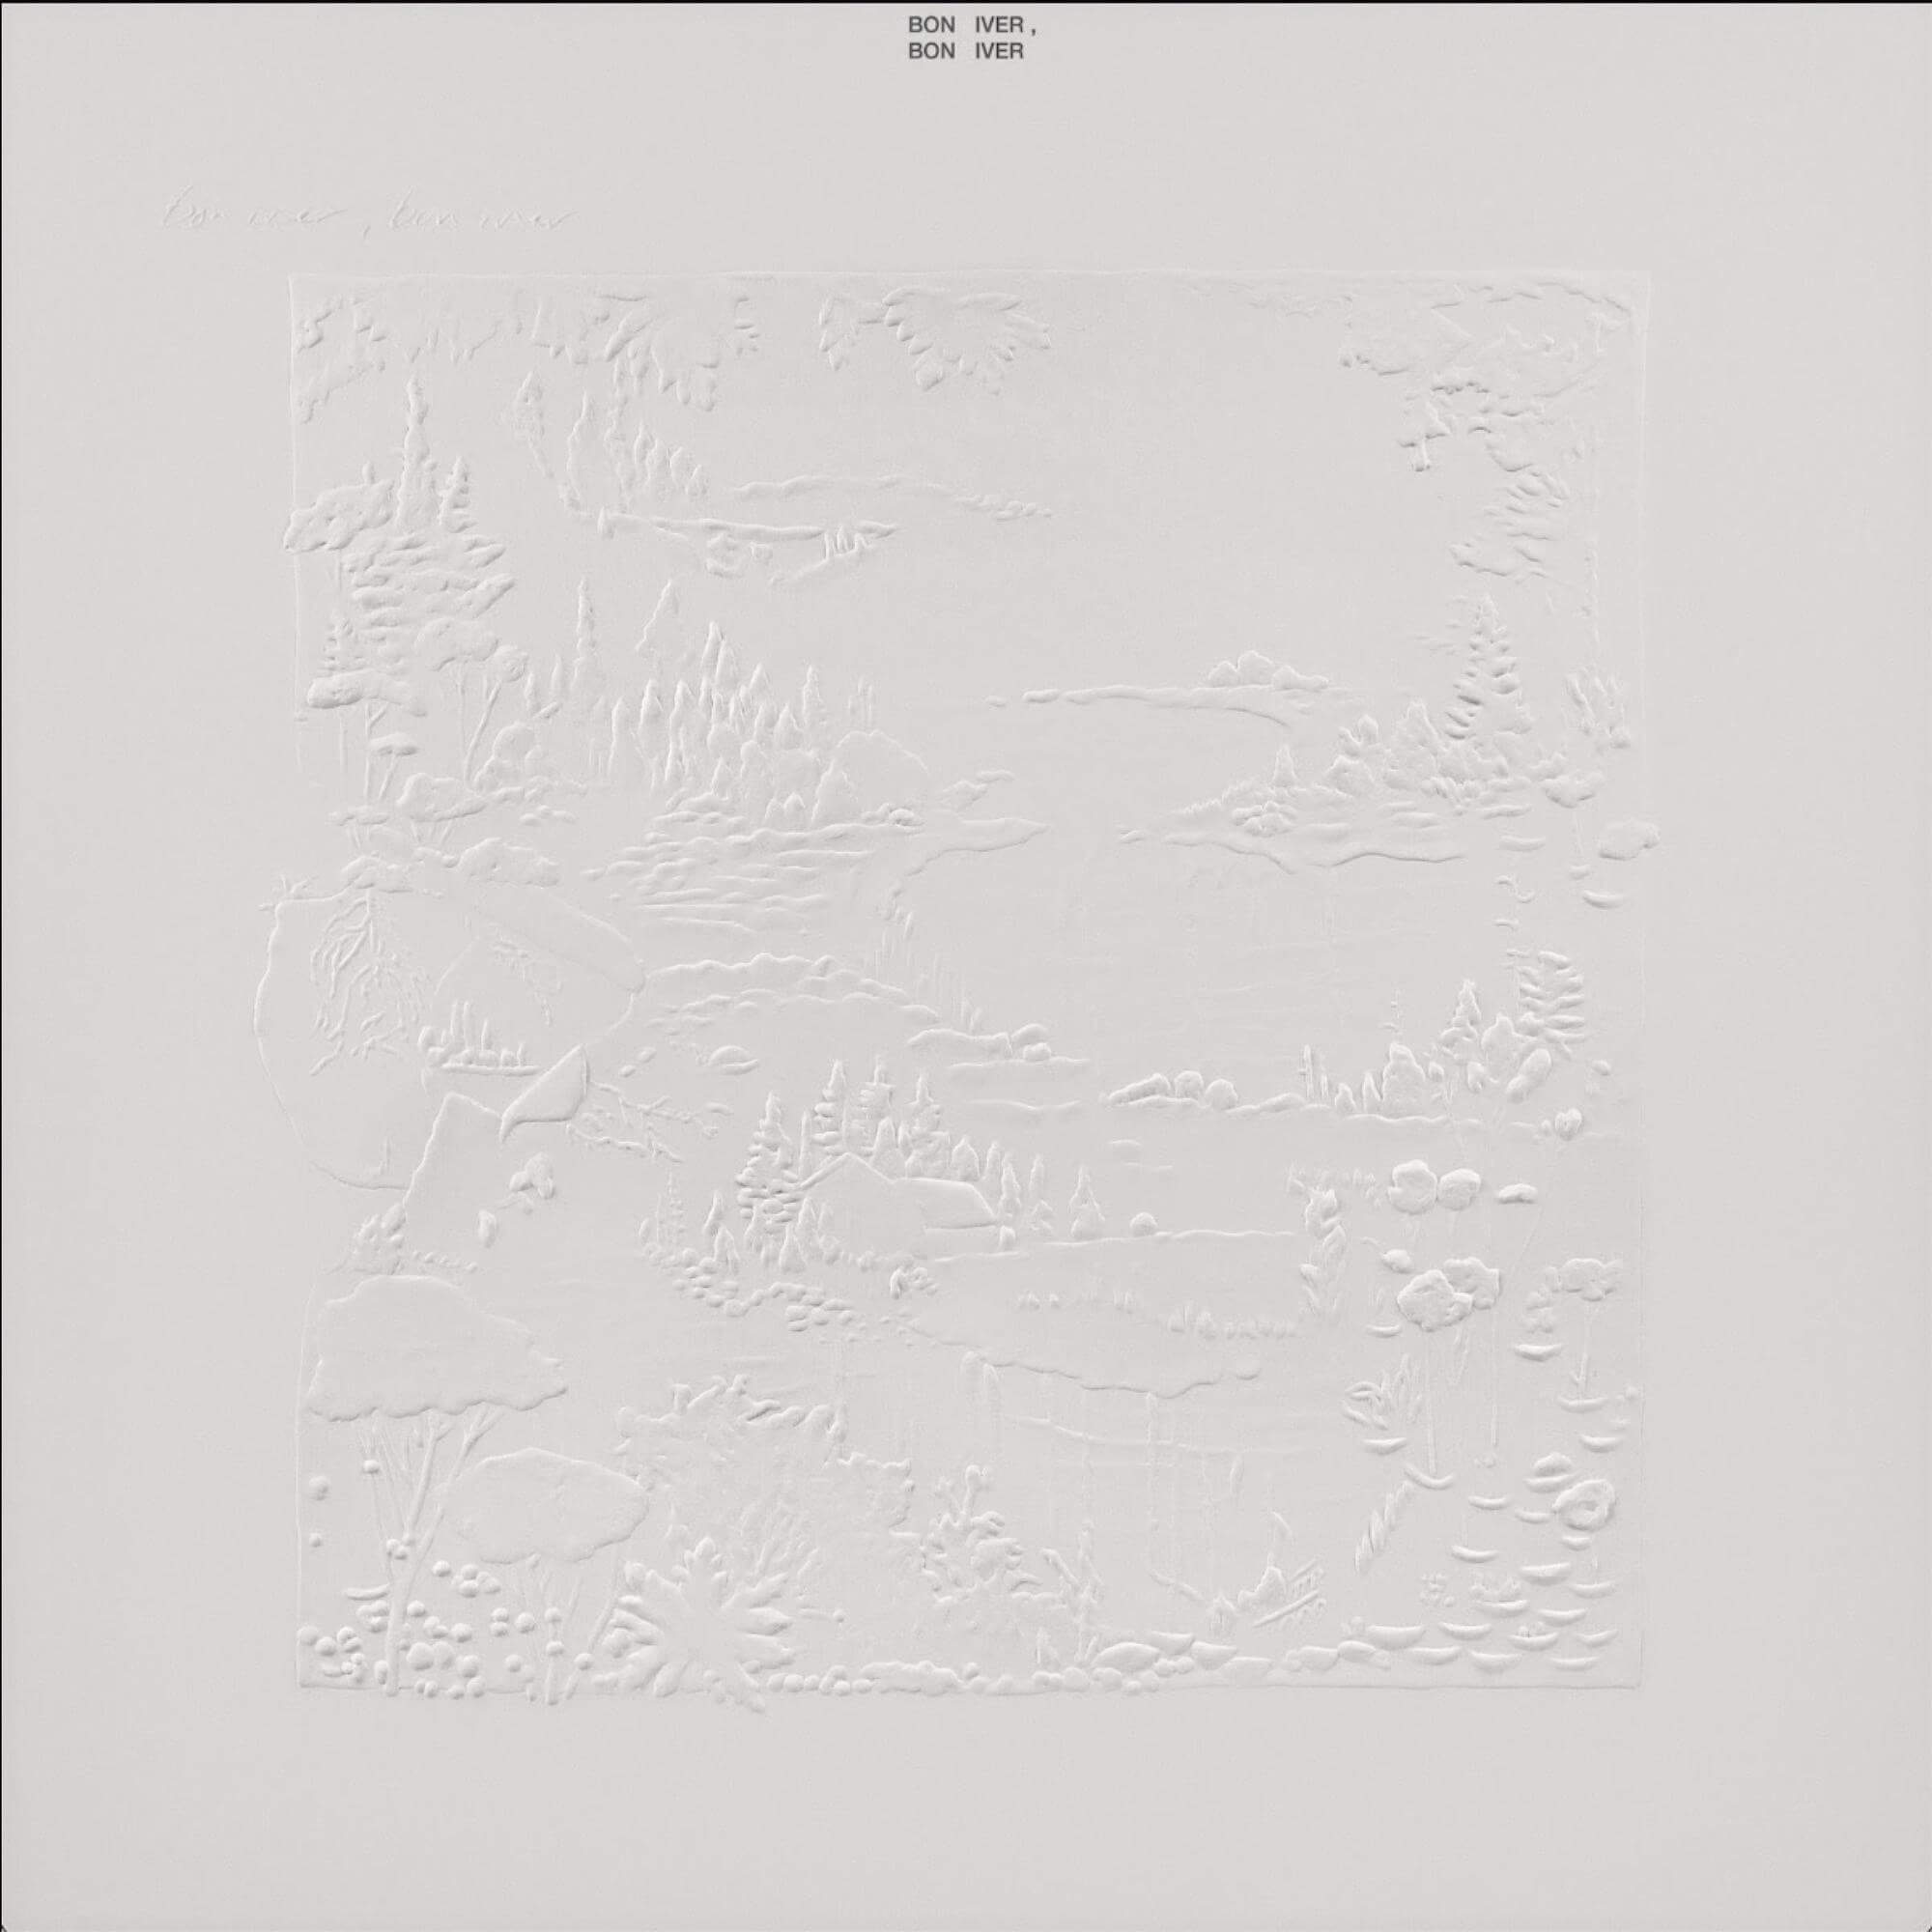 Bon Iver album cover